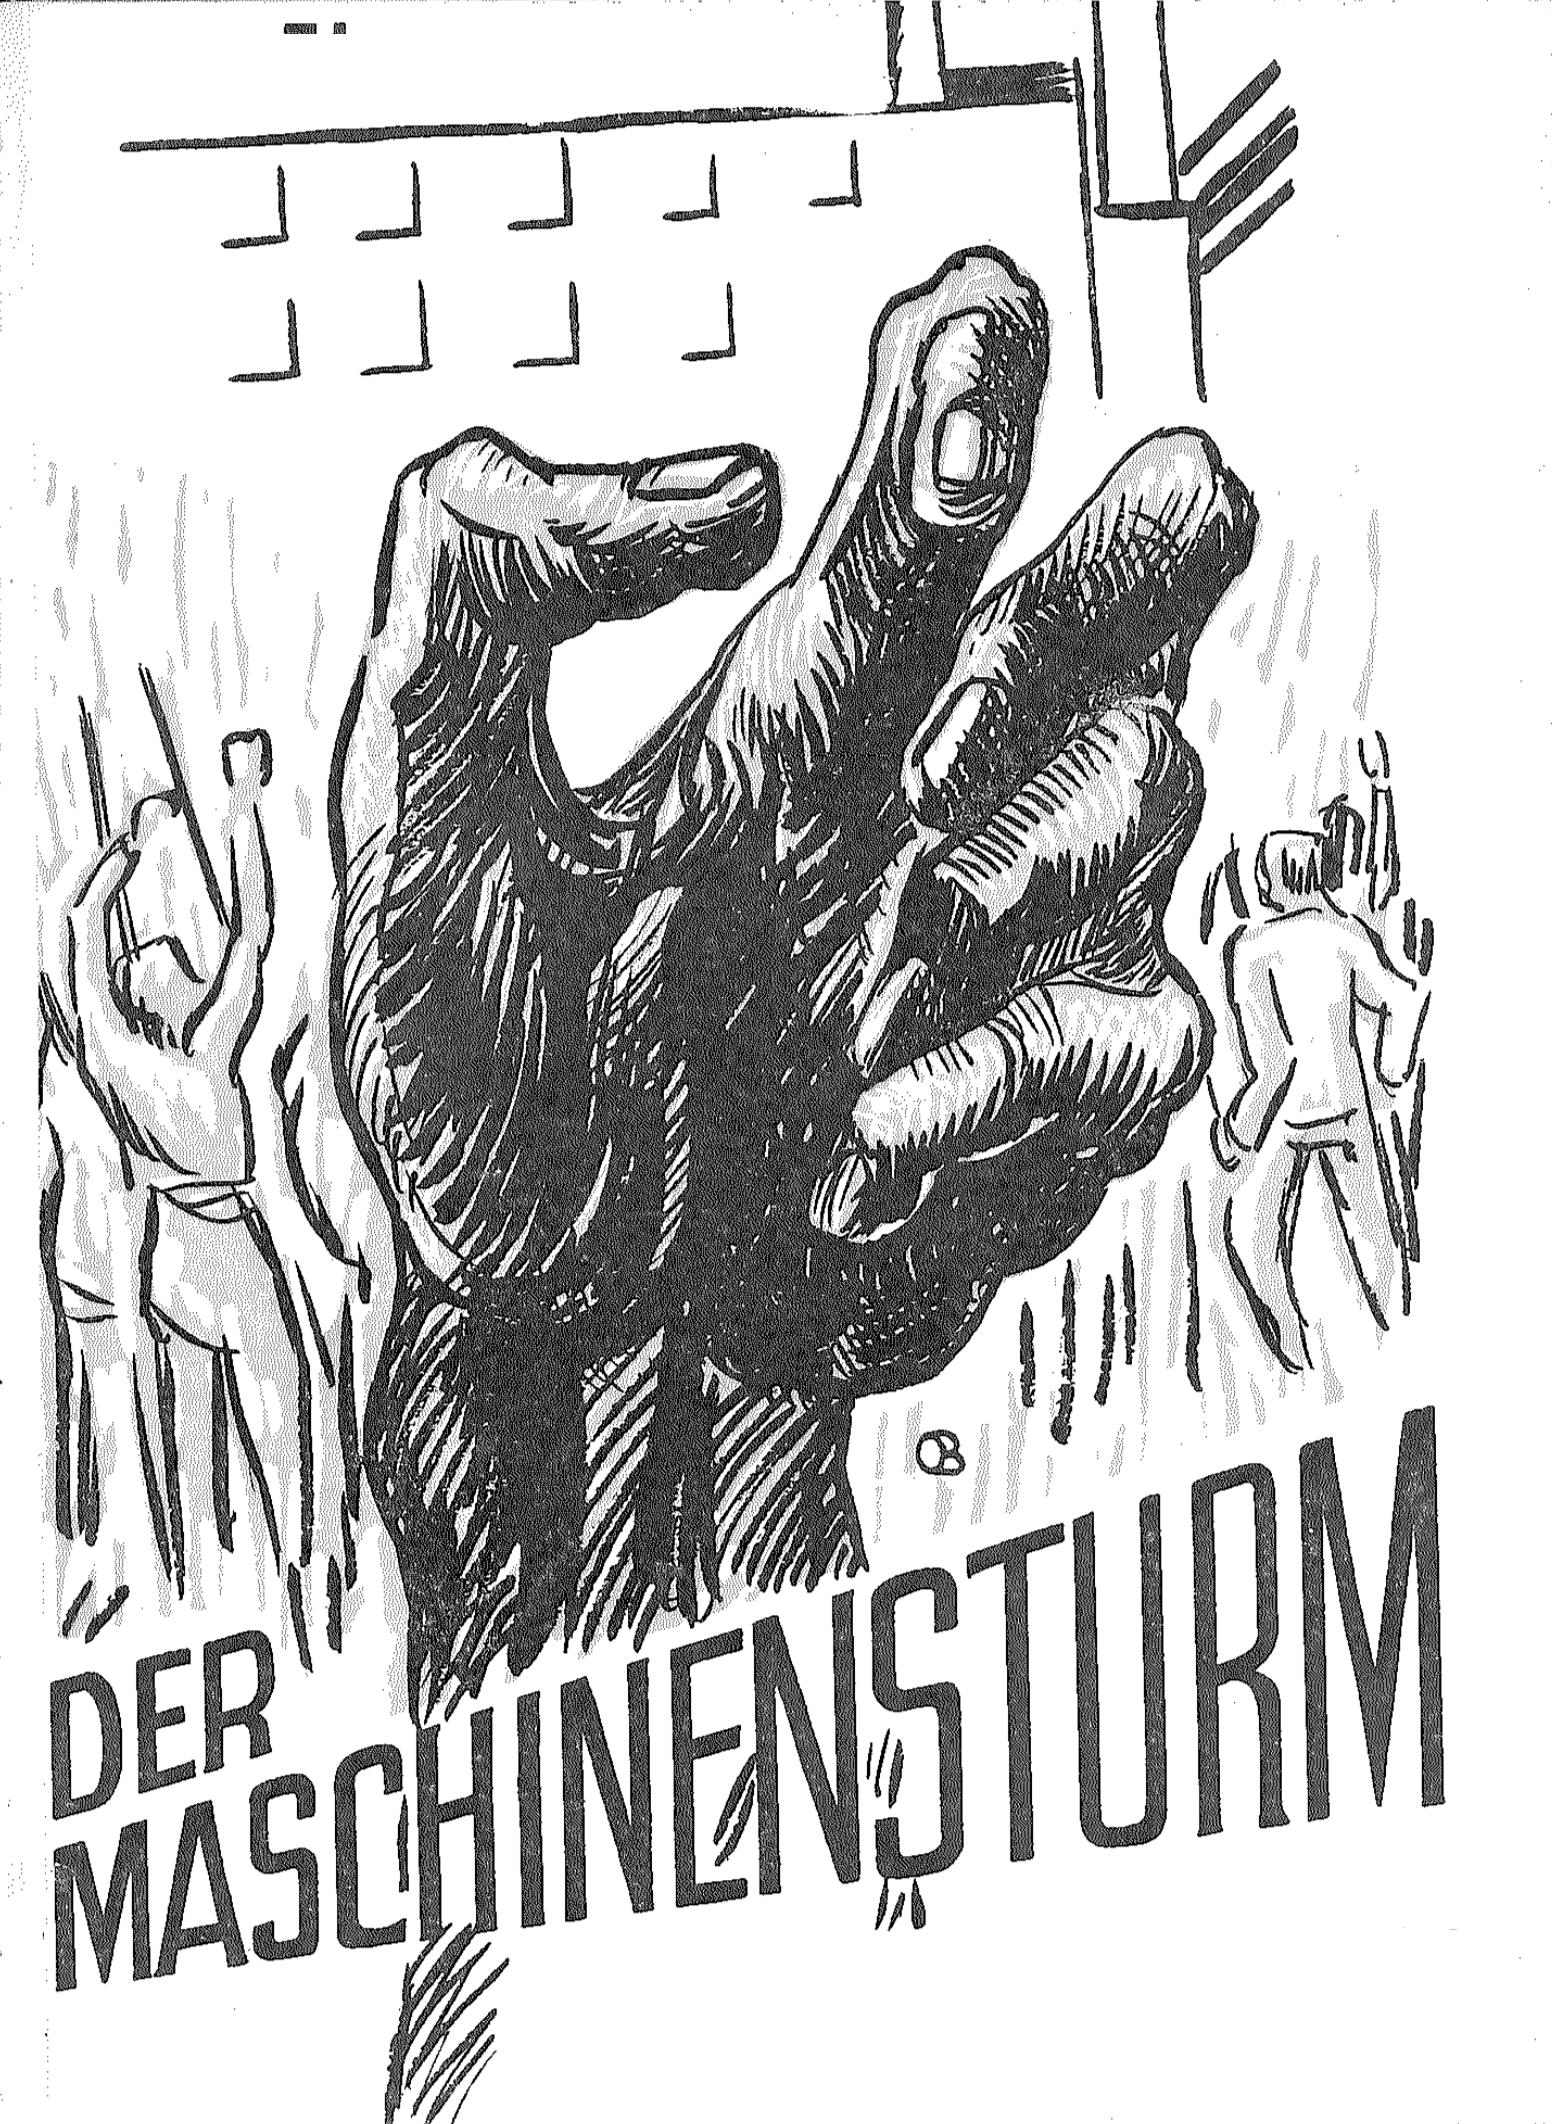 Maschinensturm, ca. 1980